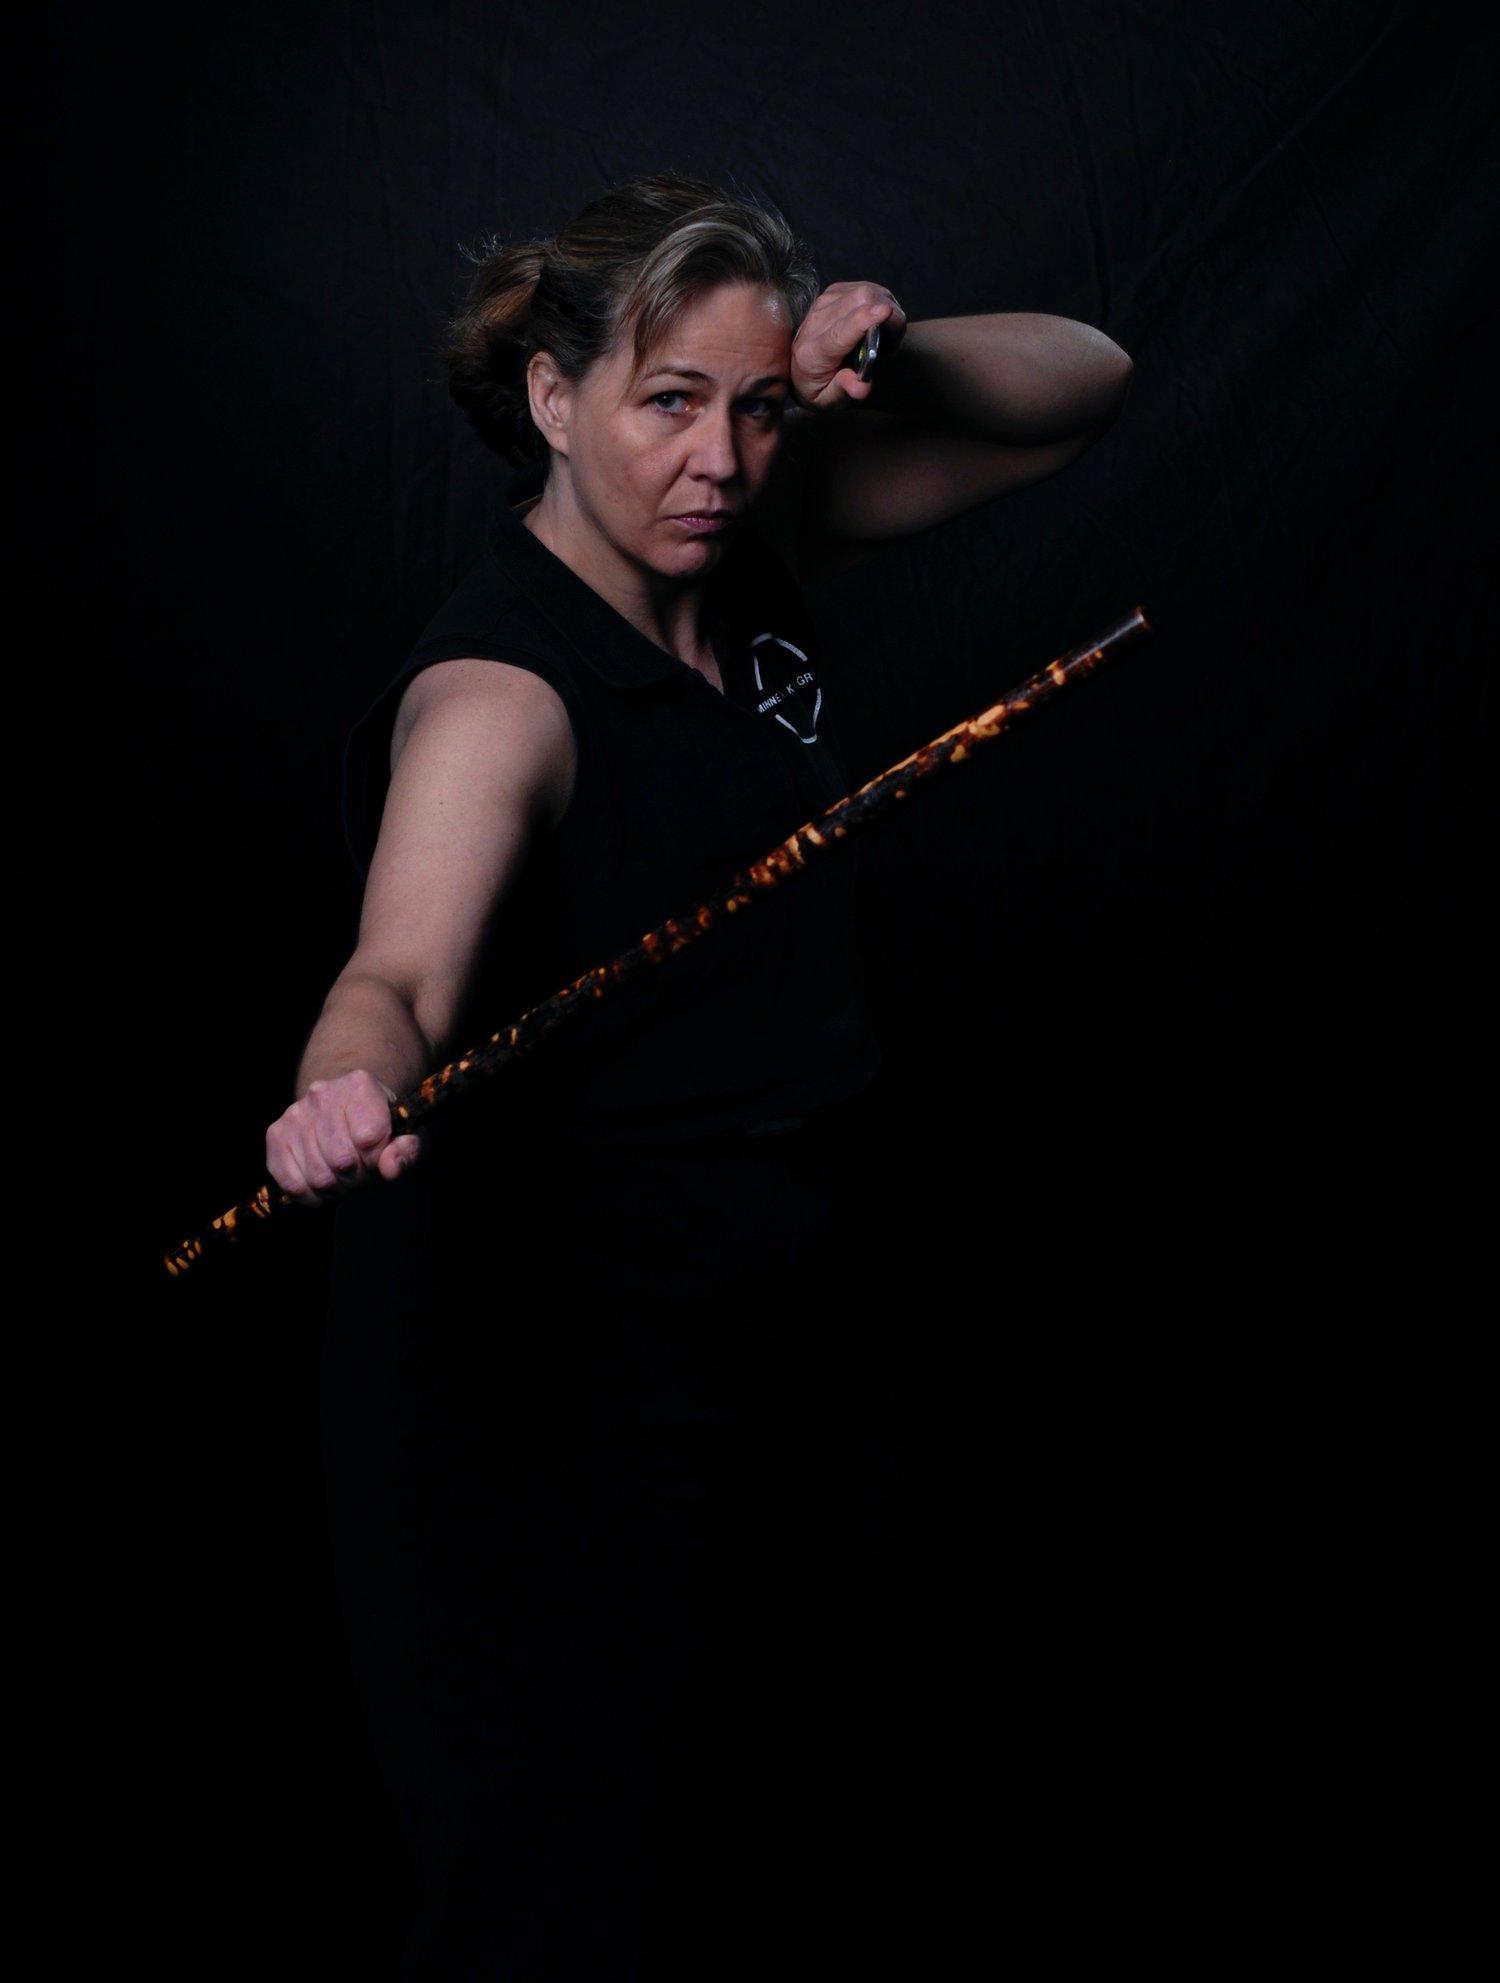 Diana Rathborne